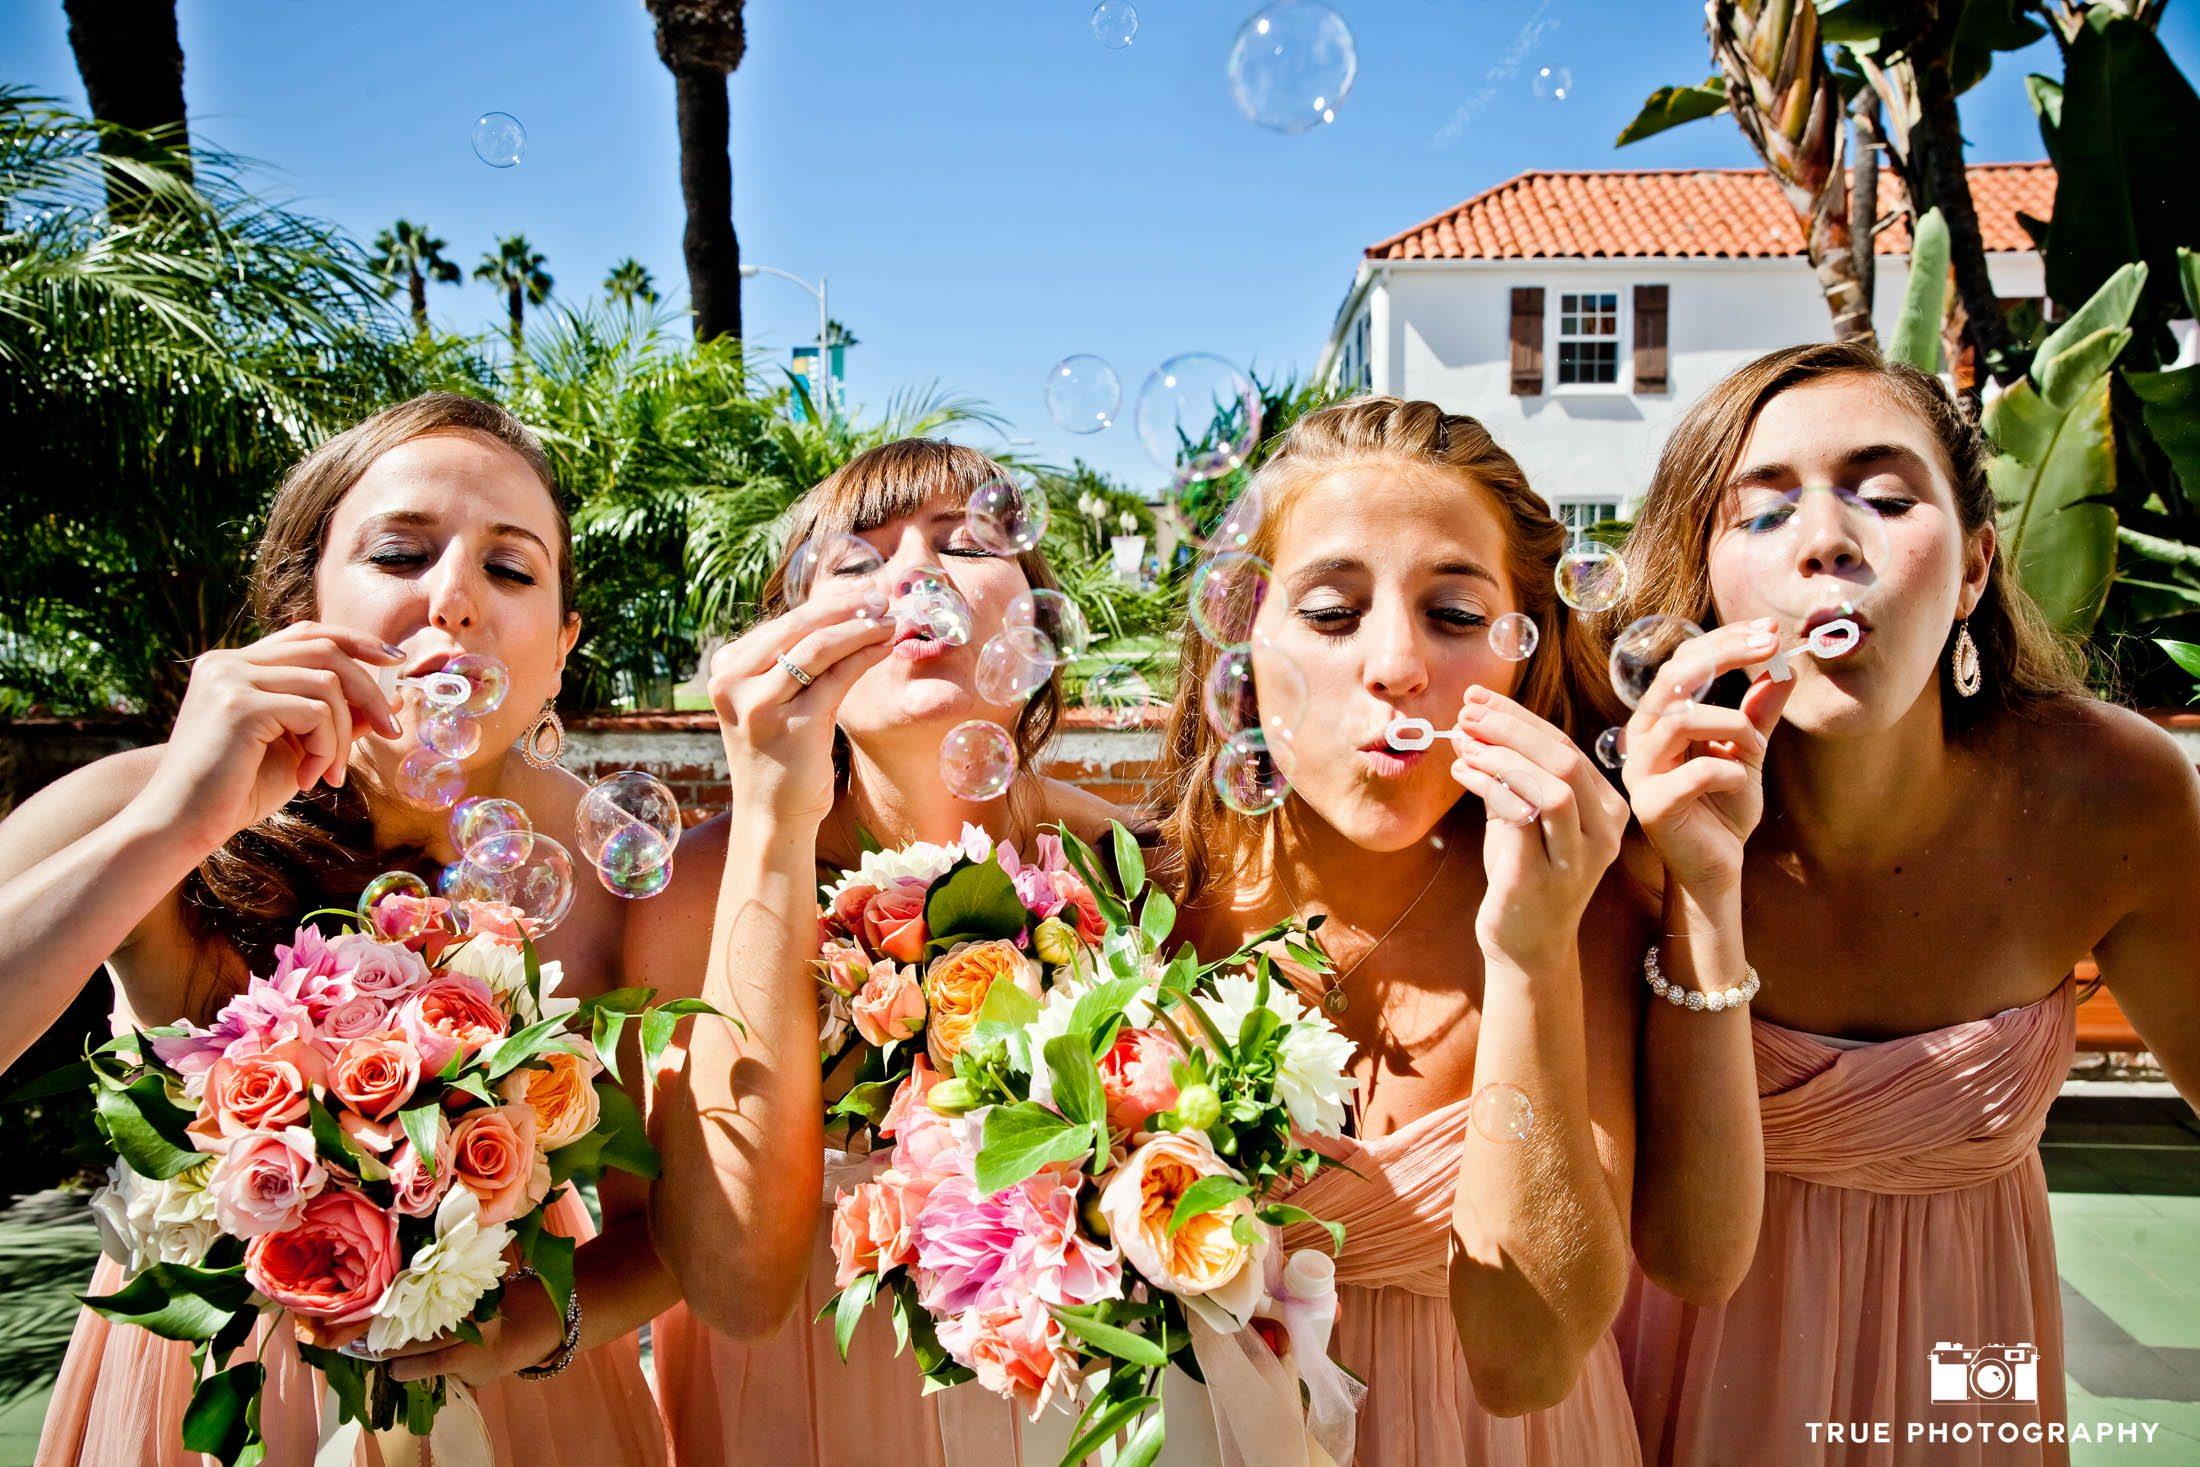 Bridesmaids blow bubbles at camera before wedding ceremony